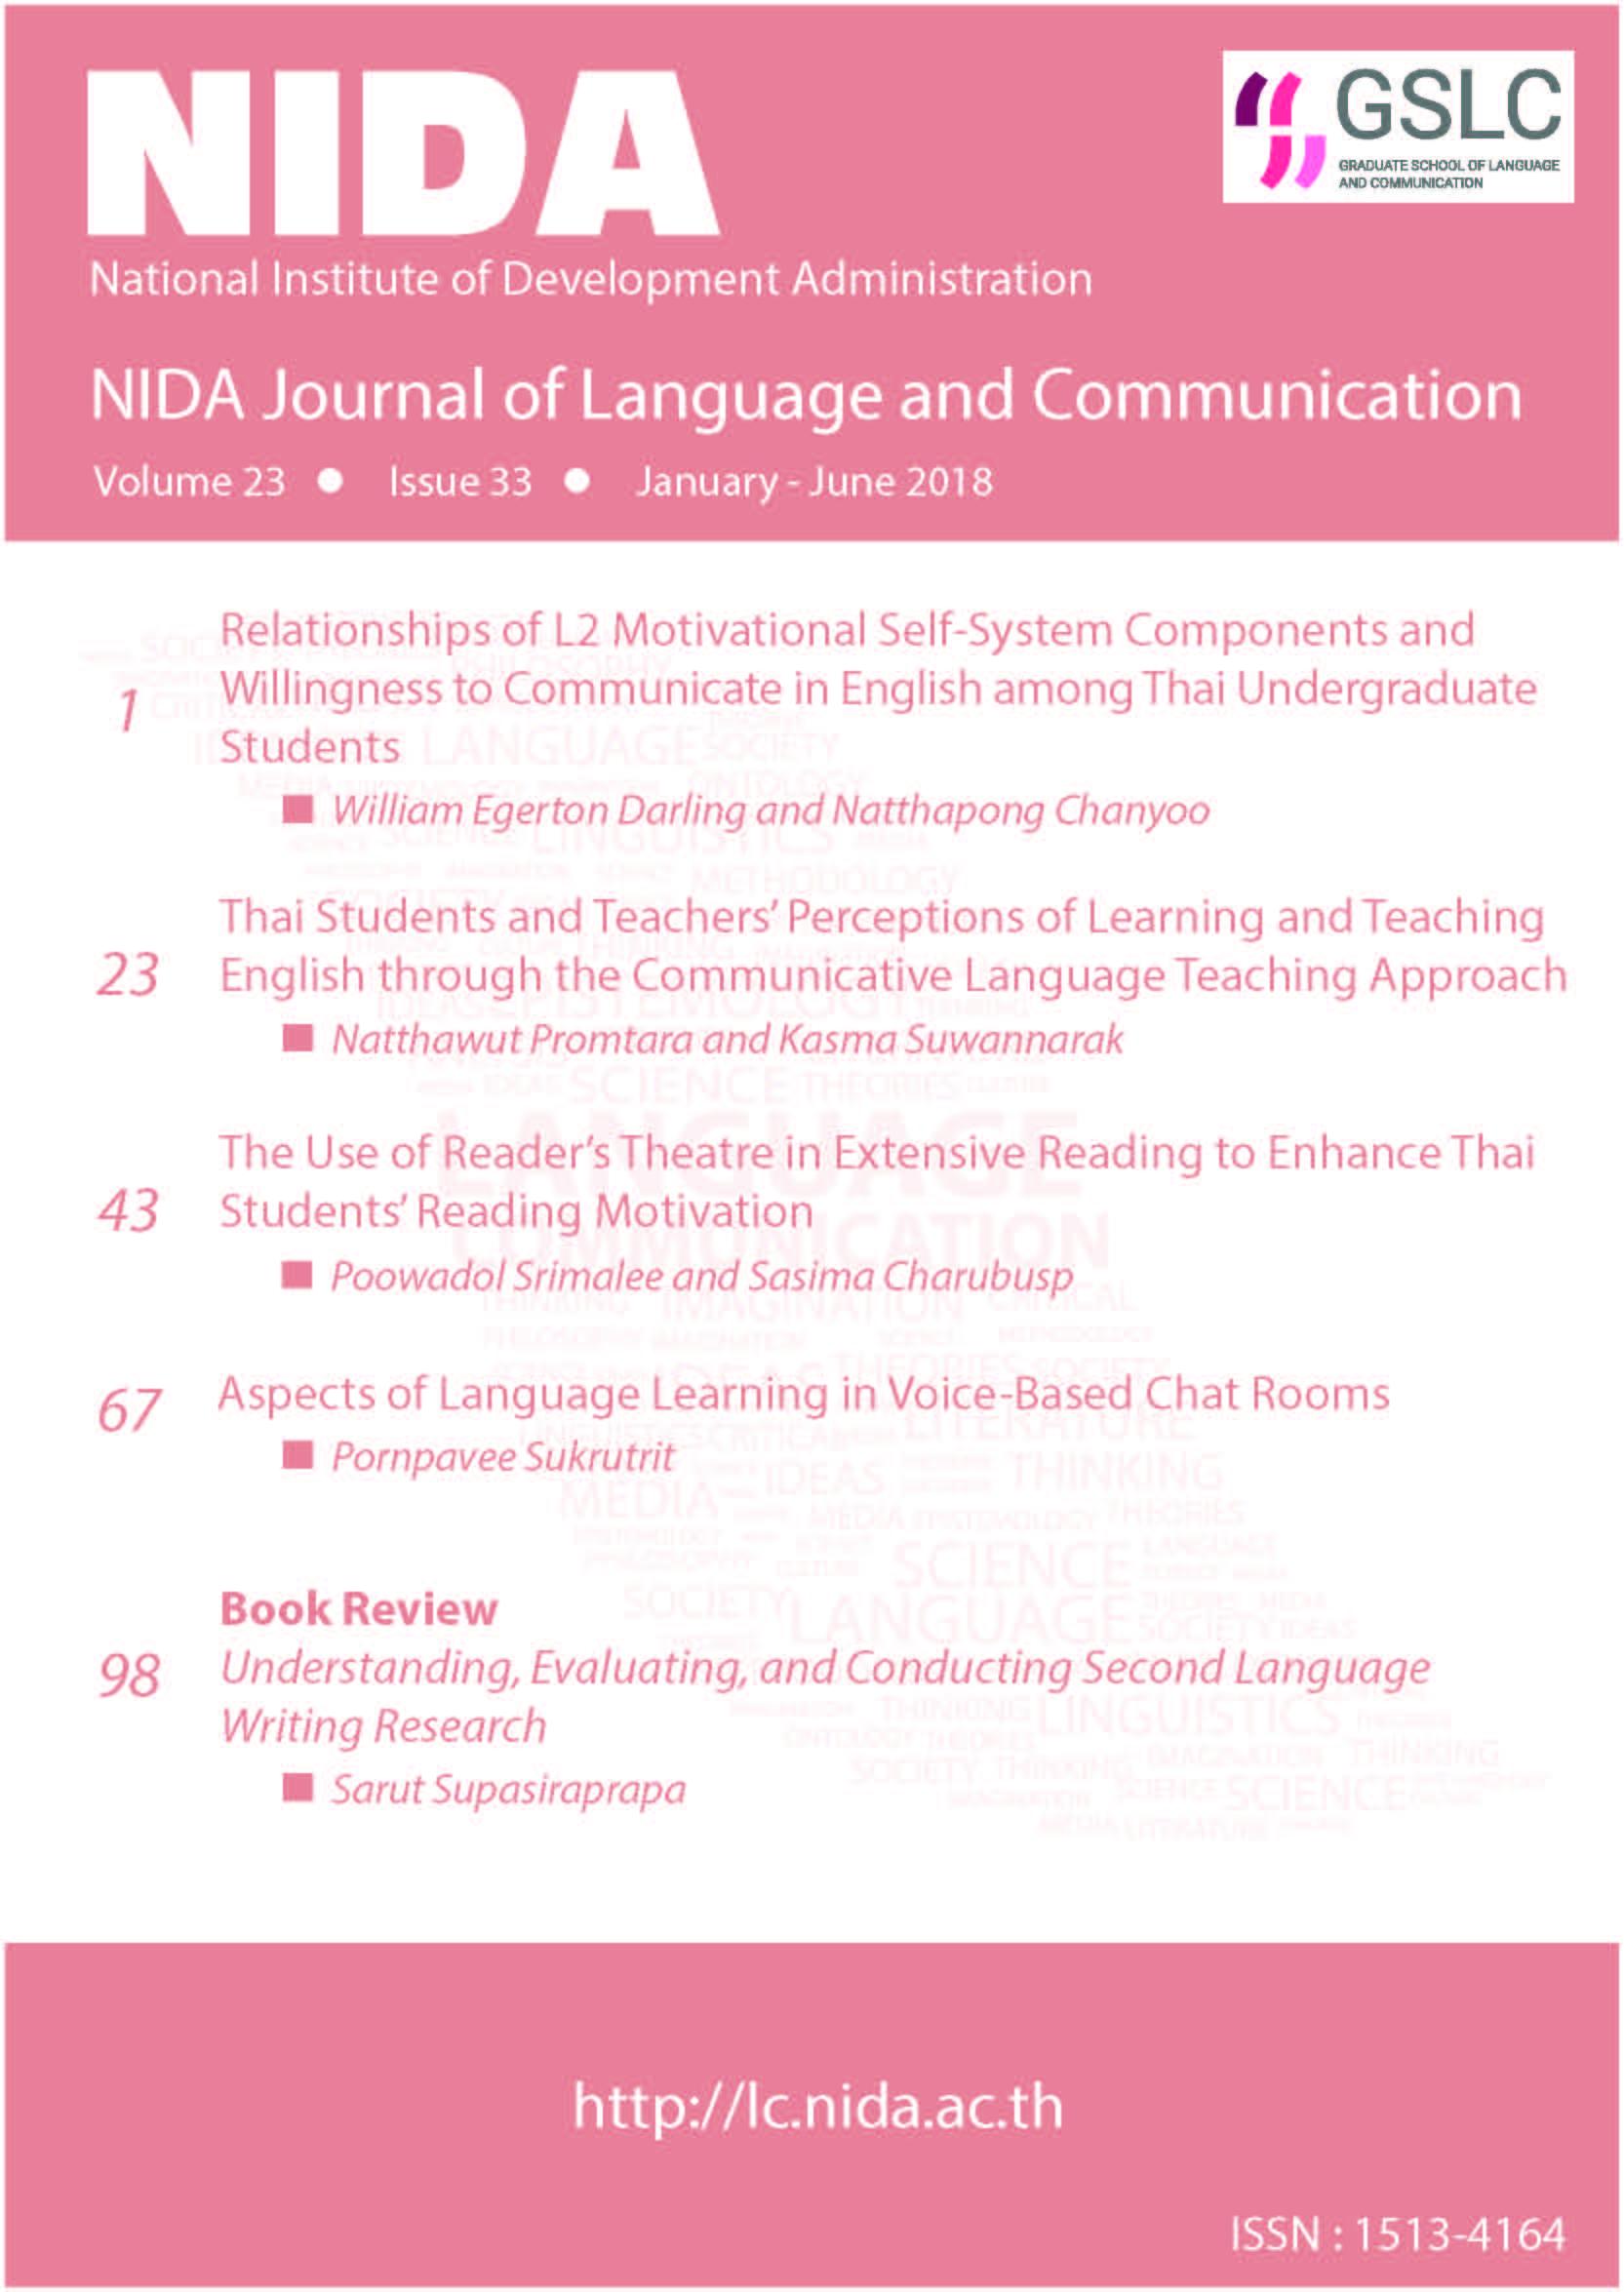 NIDA Journal of Language and Communication